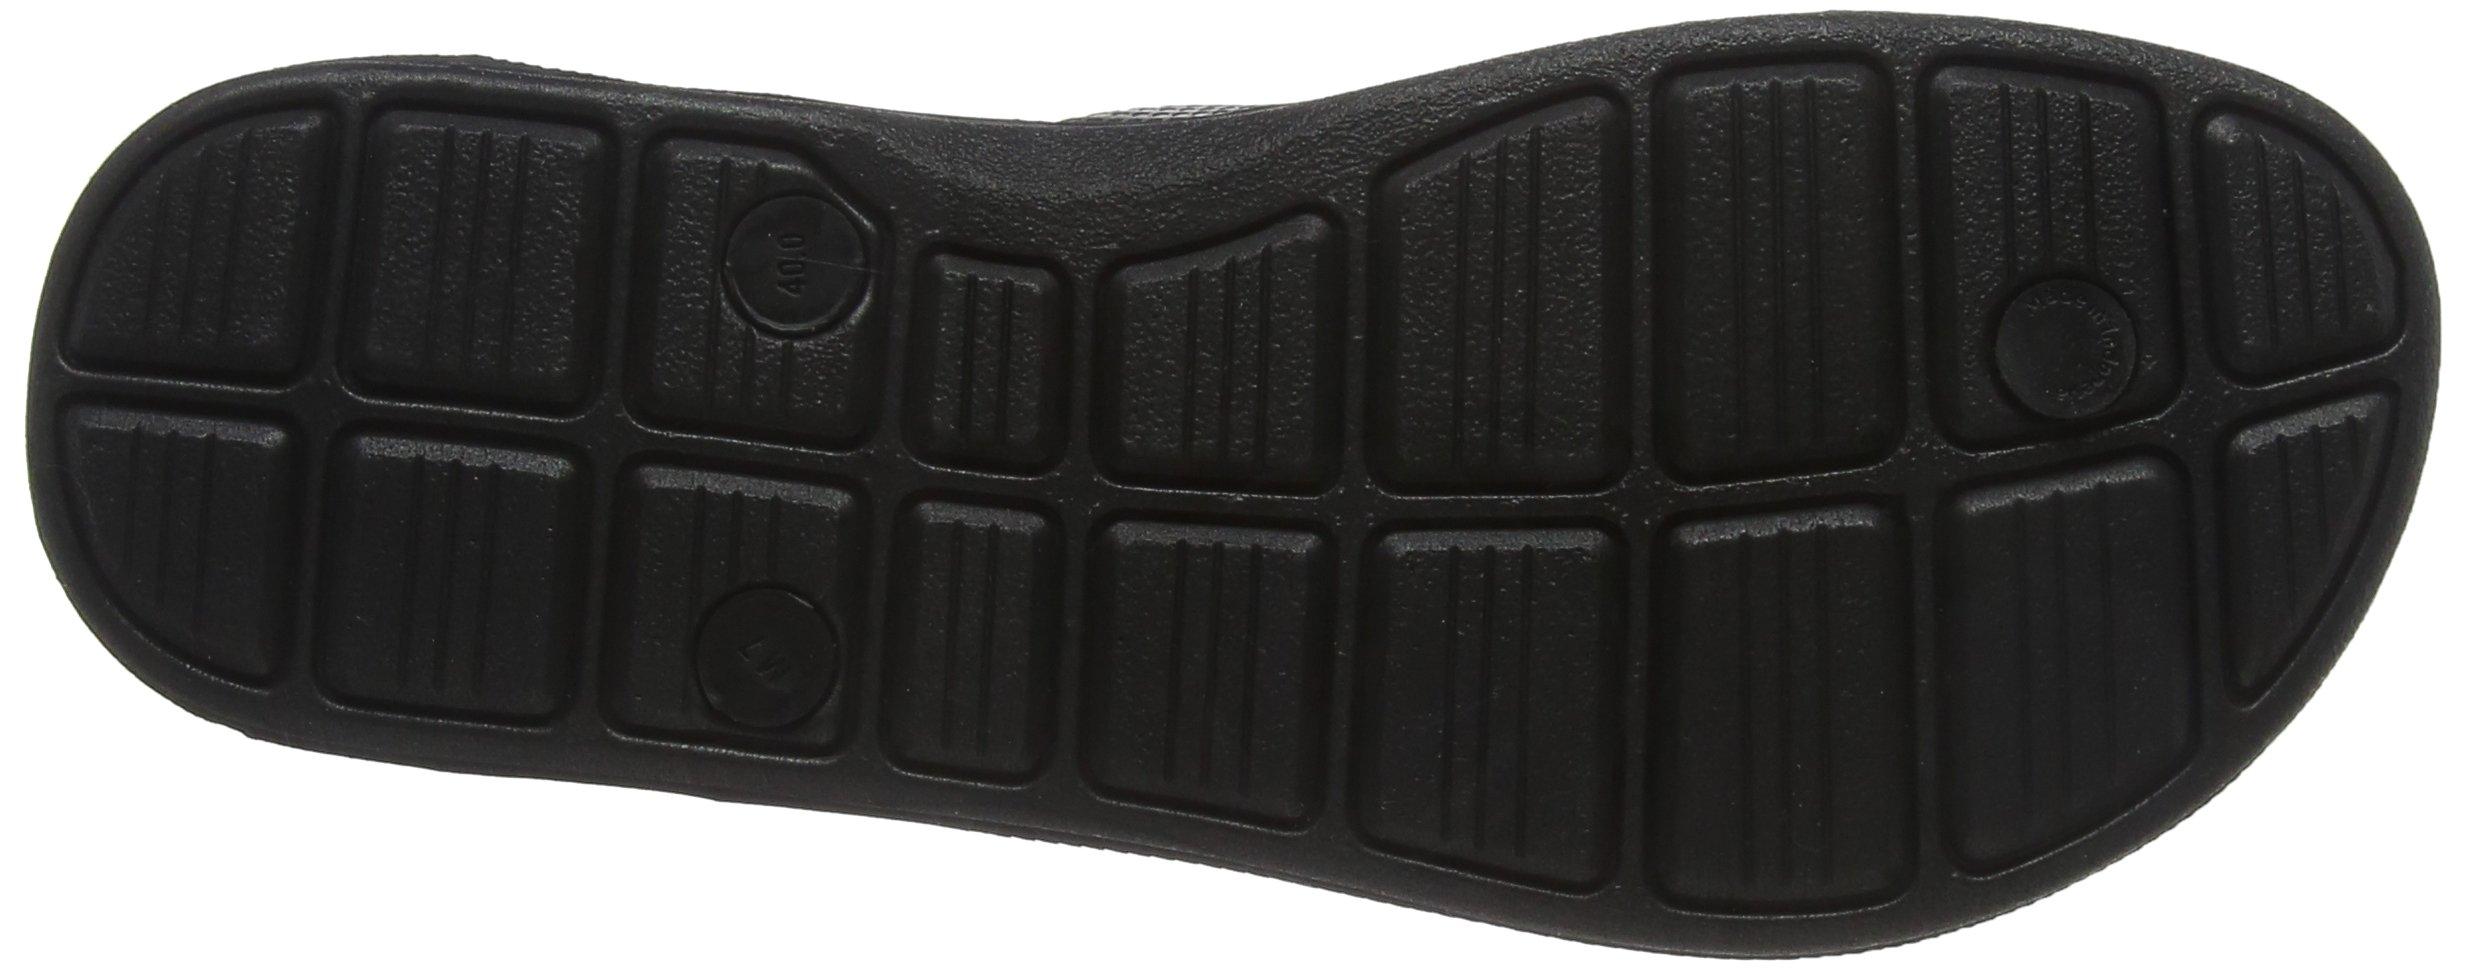 NIKE Mens Solarsoft II FLIP Flop Black Cool Grey Cool Grey Size 12 by NIKE (Image #3)